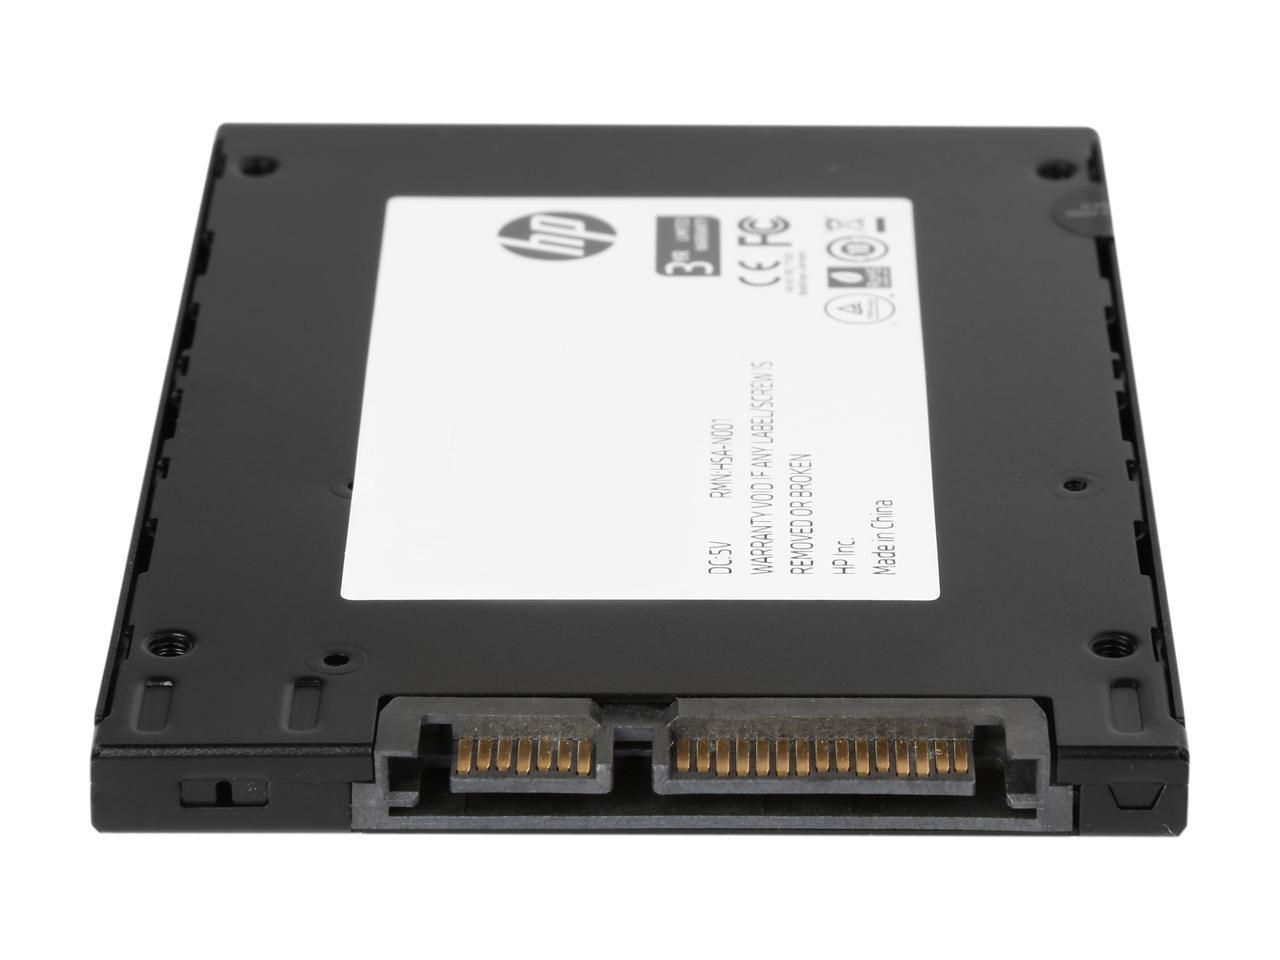 HP-S700-2-5-034-500GB-SATA-III-3D-NAND-Internal-Solid-State-Drive-SSD-2DP99AA-ABC thumbnail 3